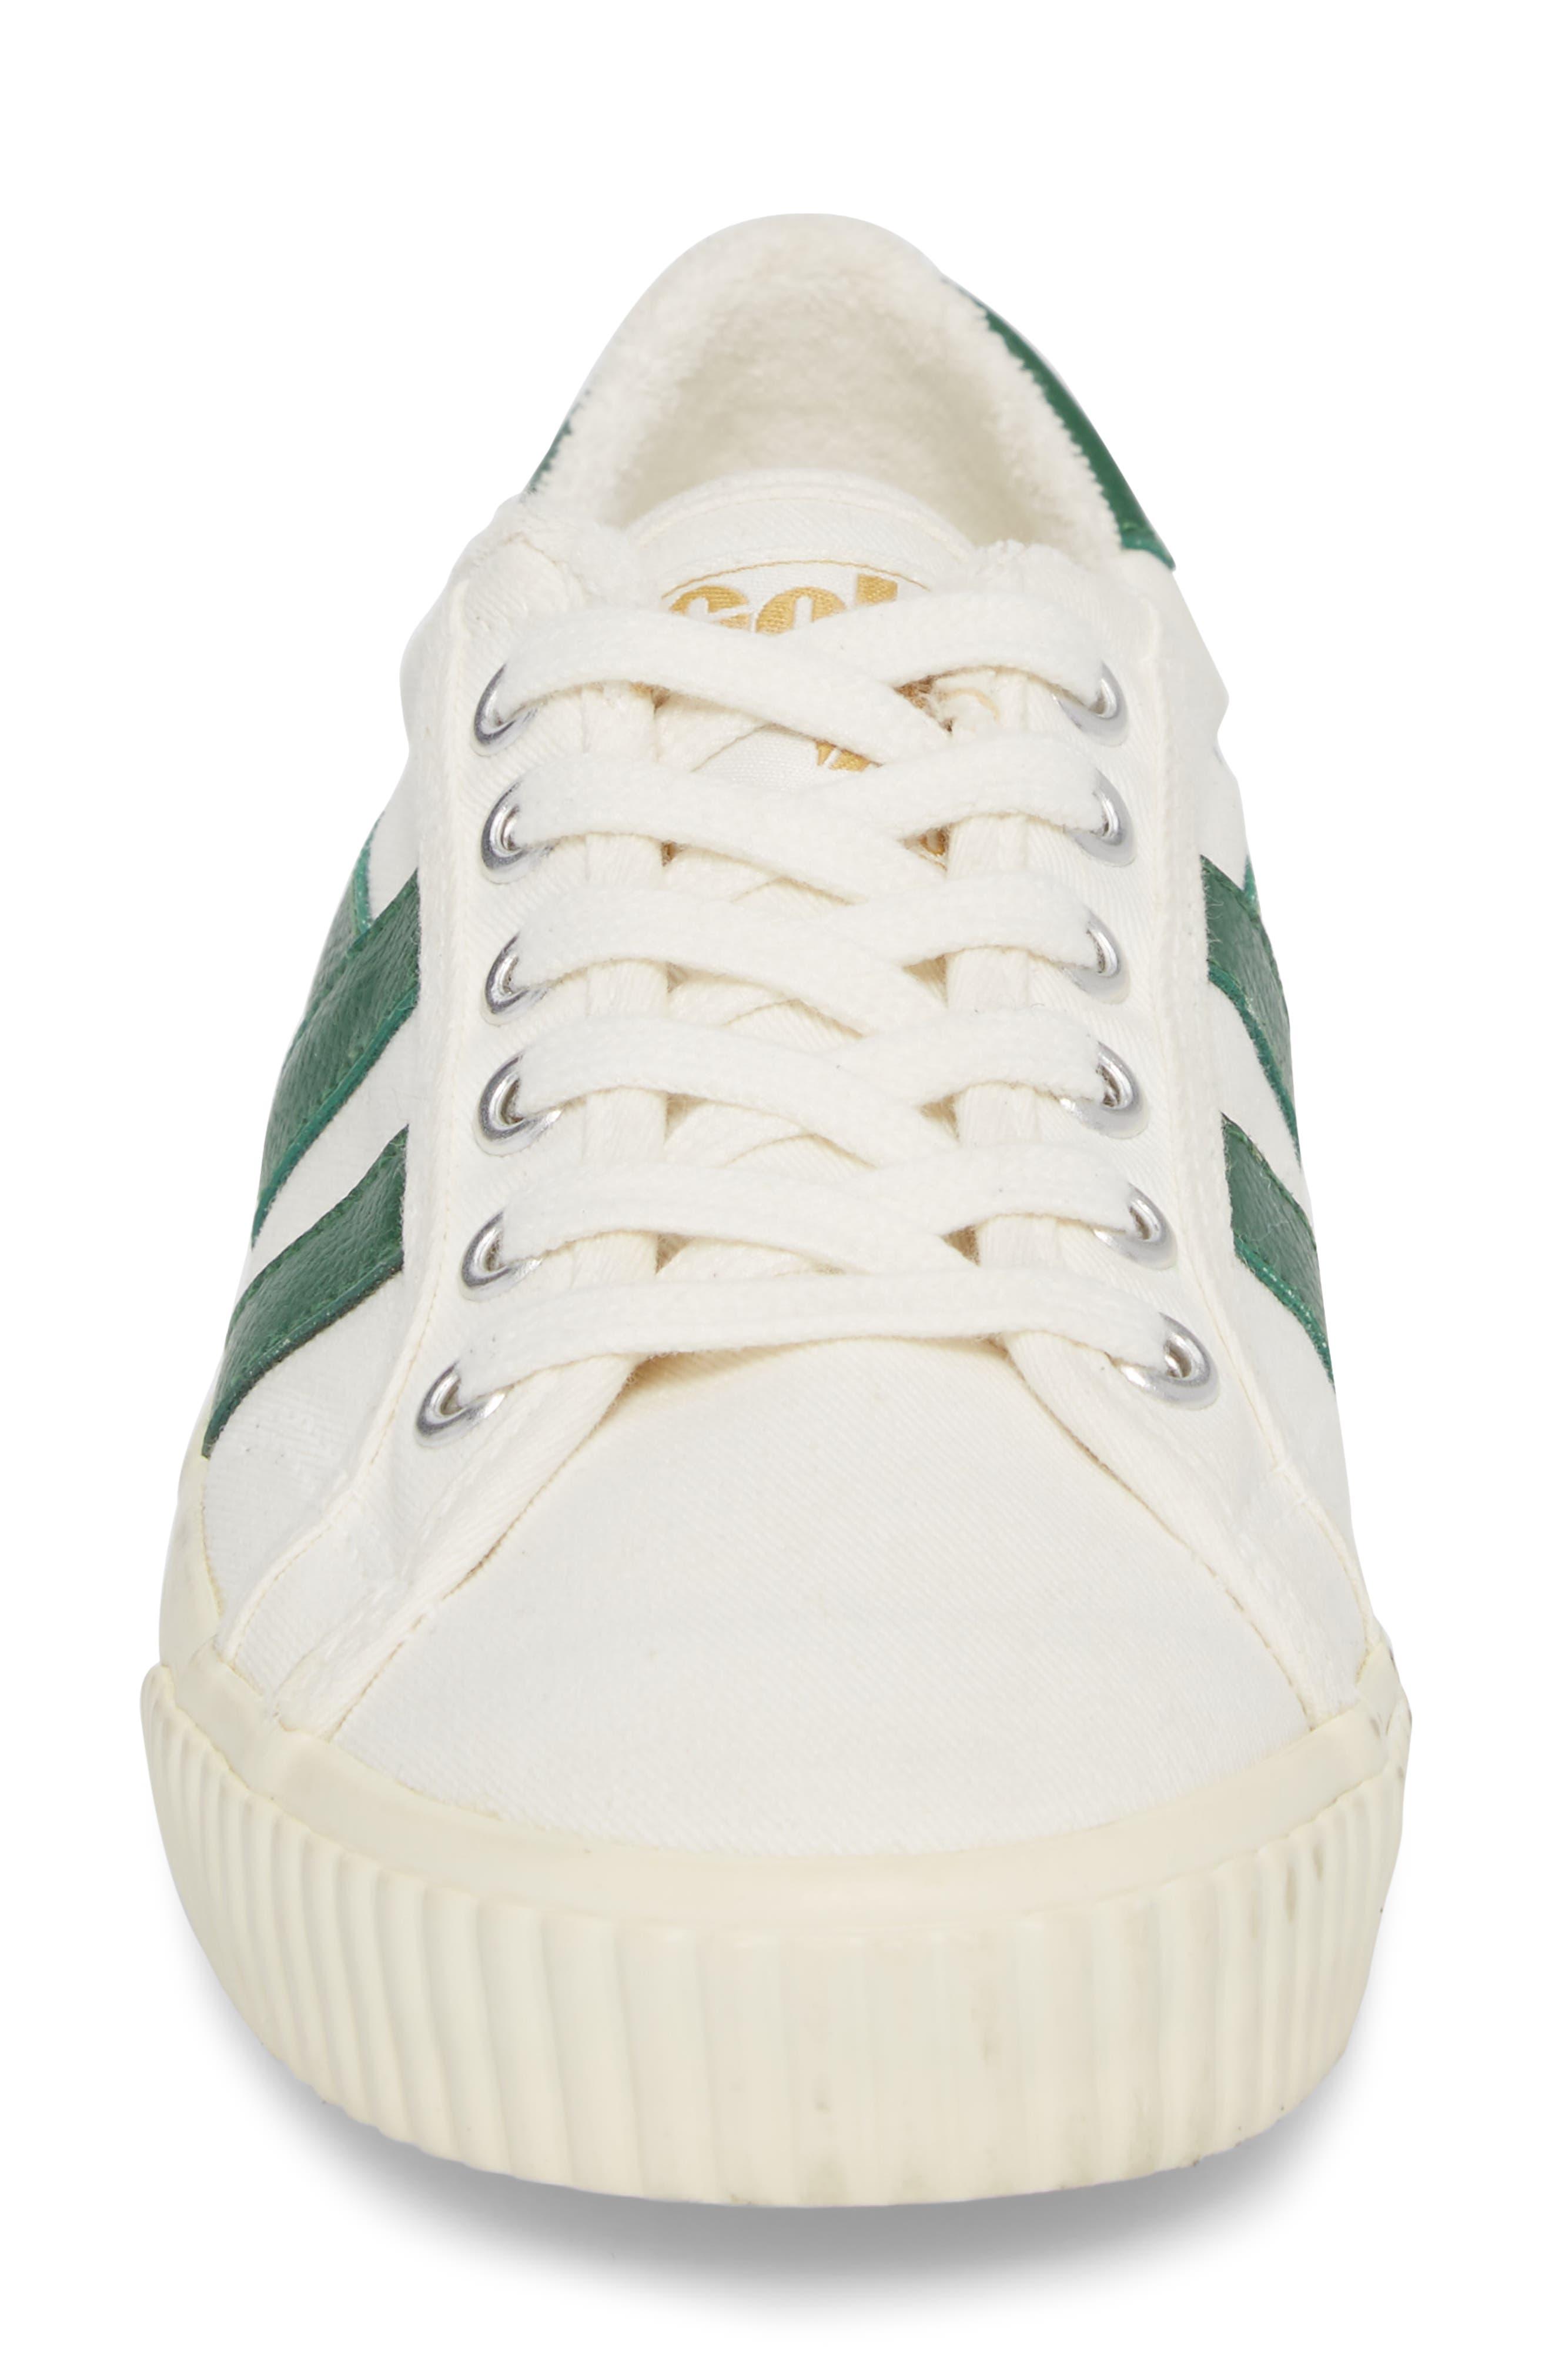 Tennis Mark Cox Sneaker,                             Alternate thumbnail 4, color,                             Off White/ Green